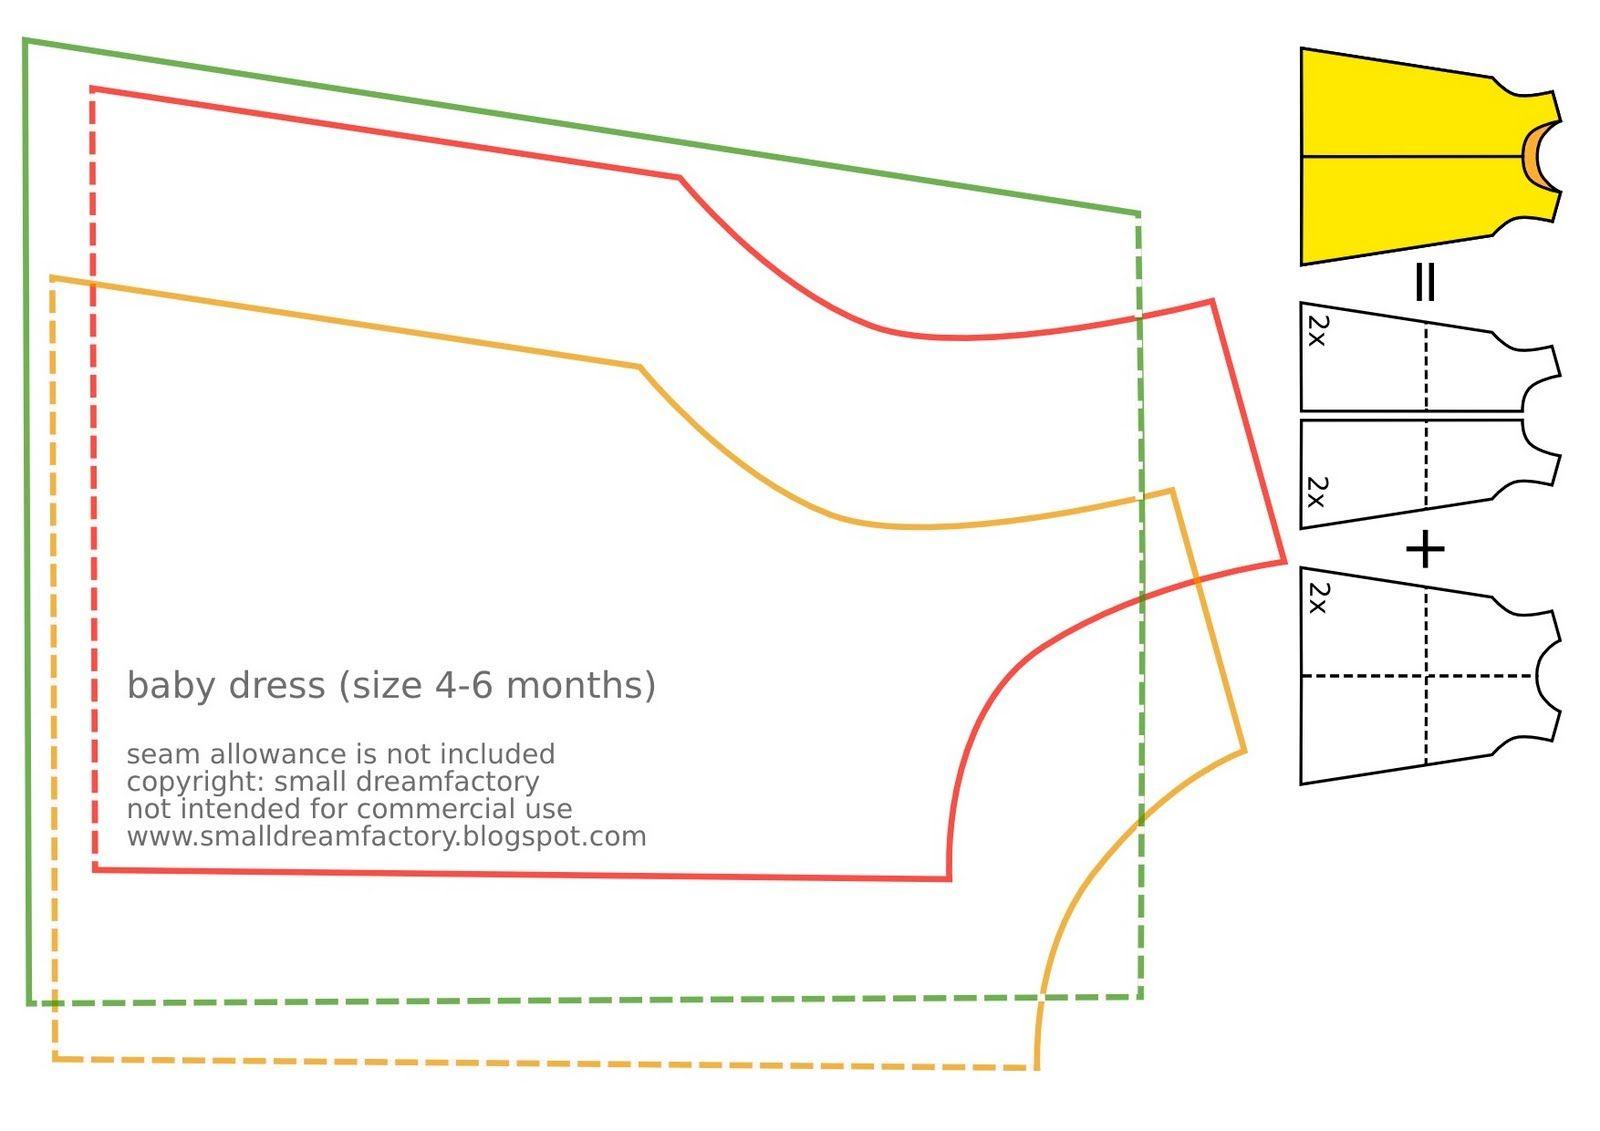 Free Printable Baby Sewing Patterns   Free Sewing Tutorial And - Free Printable Pillowcase Dress Pattern